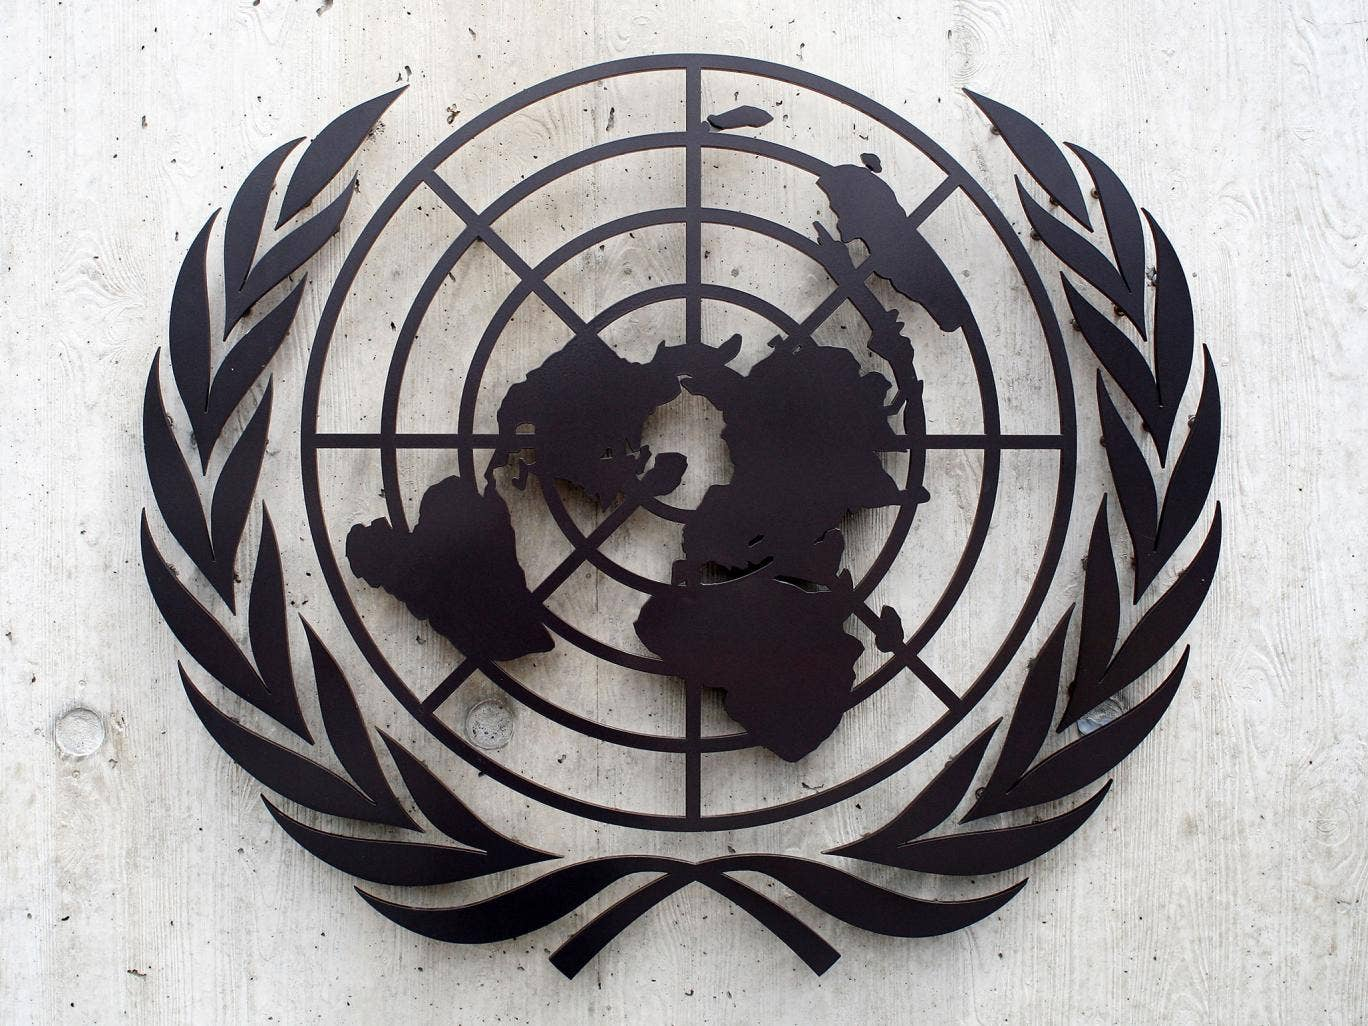 UN calls on world to unite against jihadist group